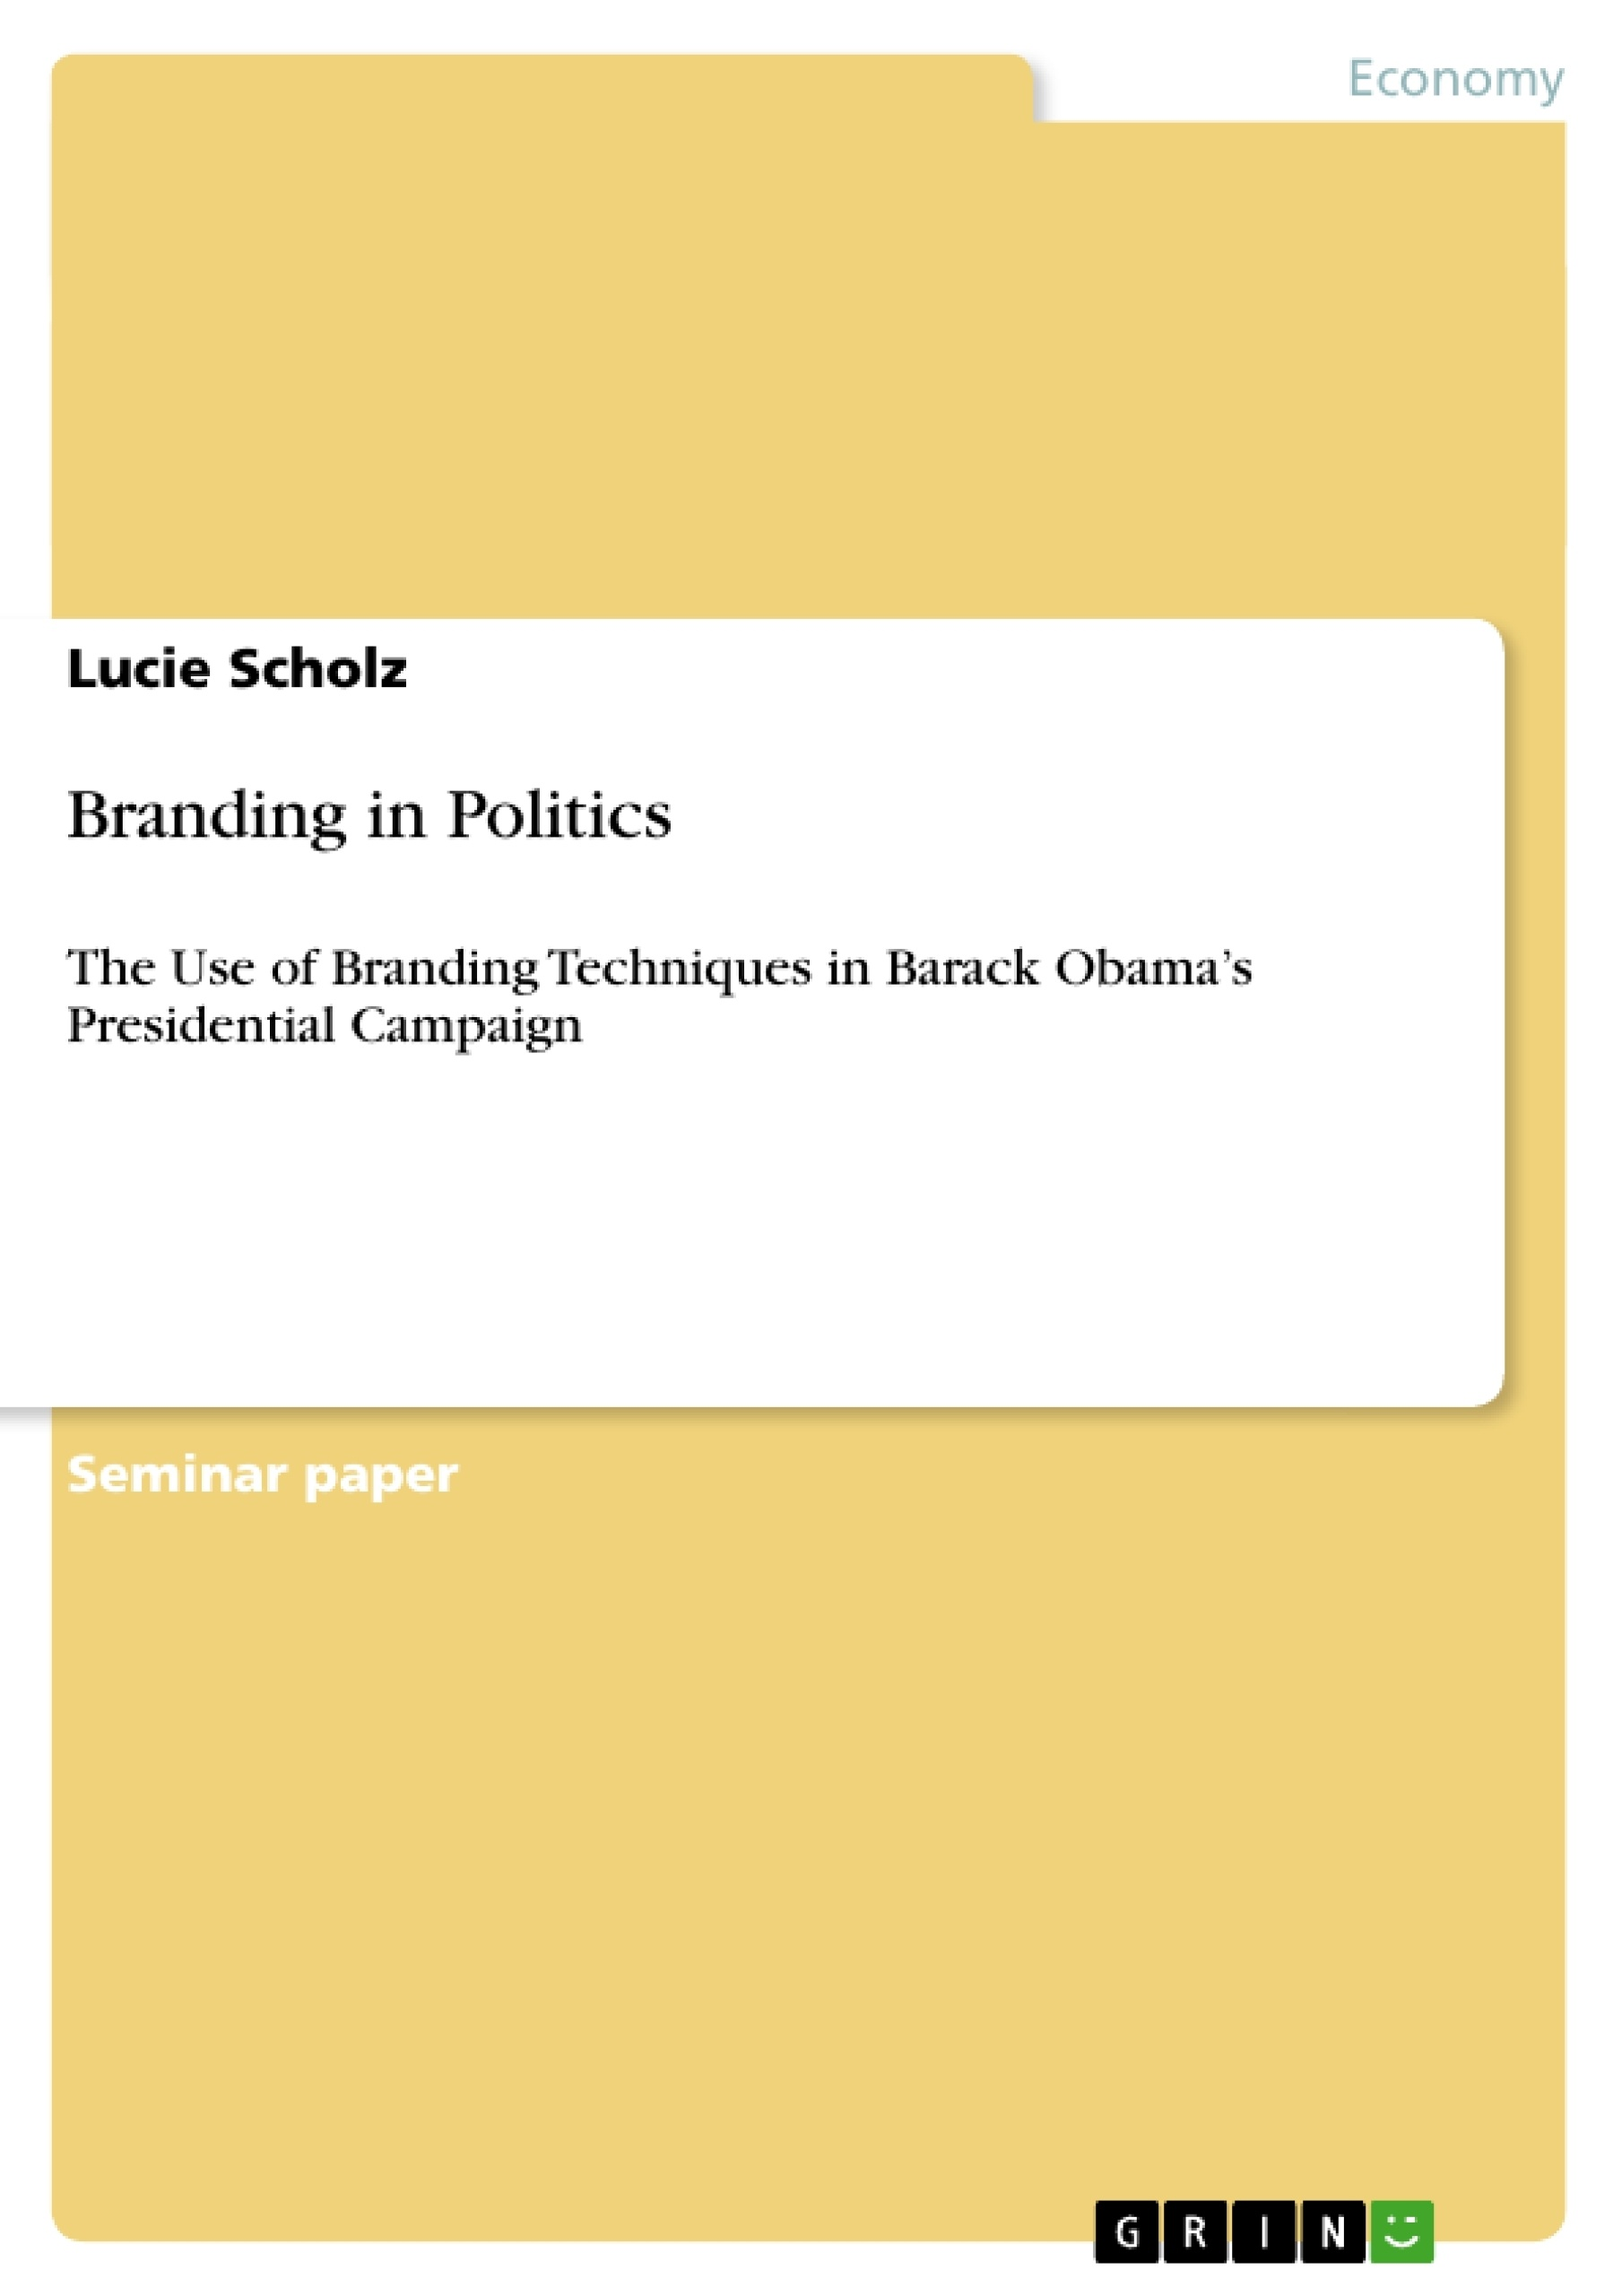 Title: Branding in Politics